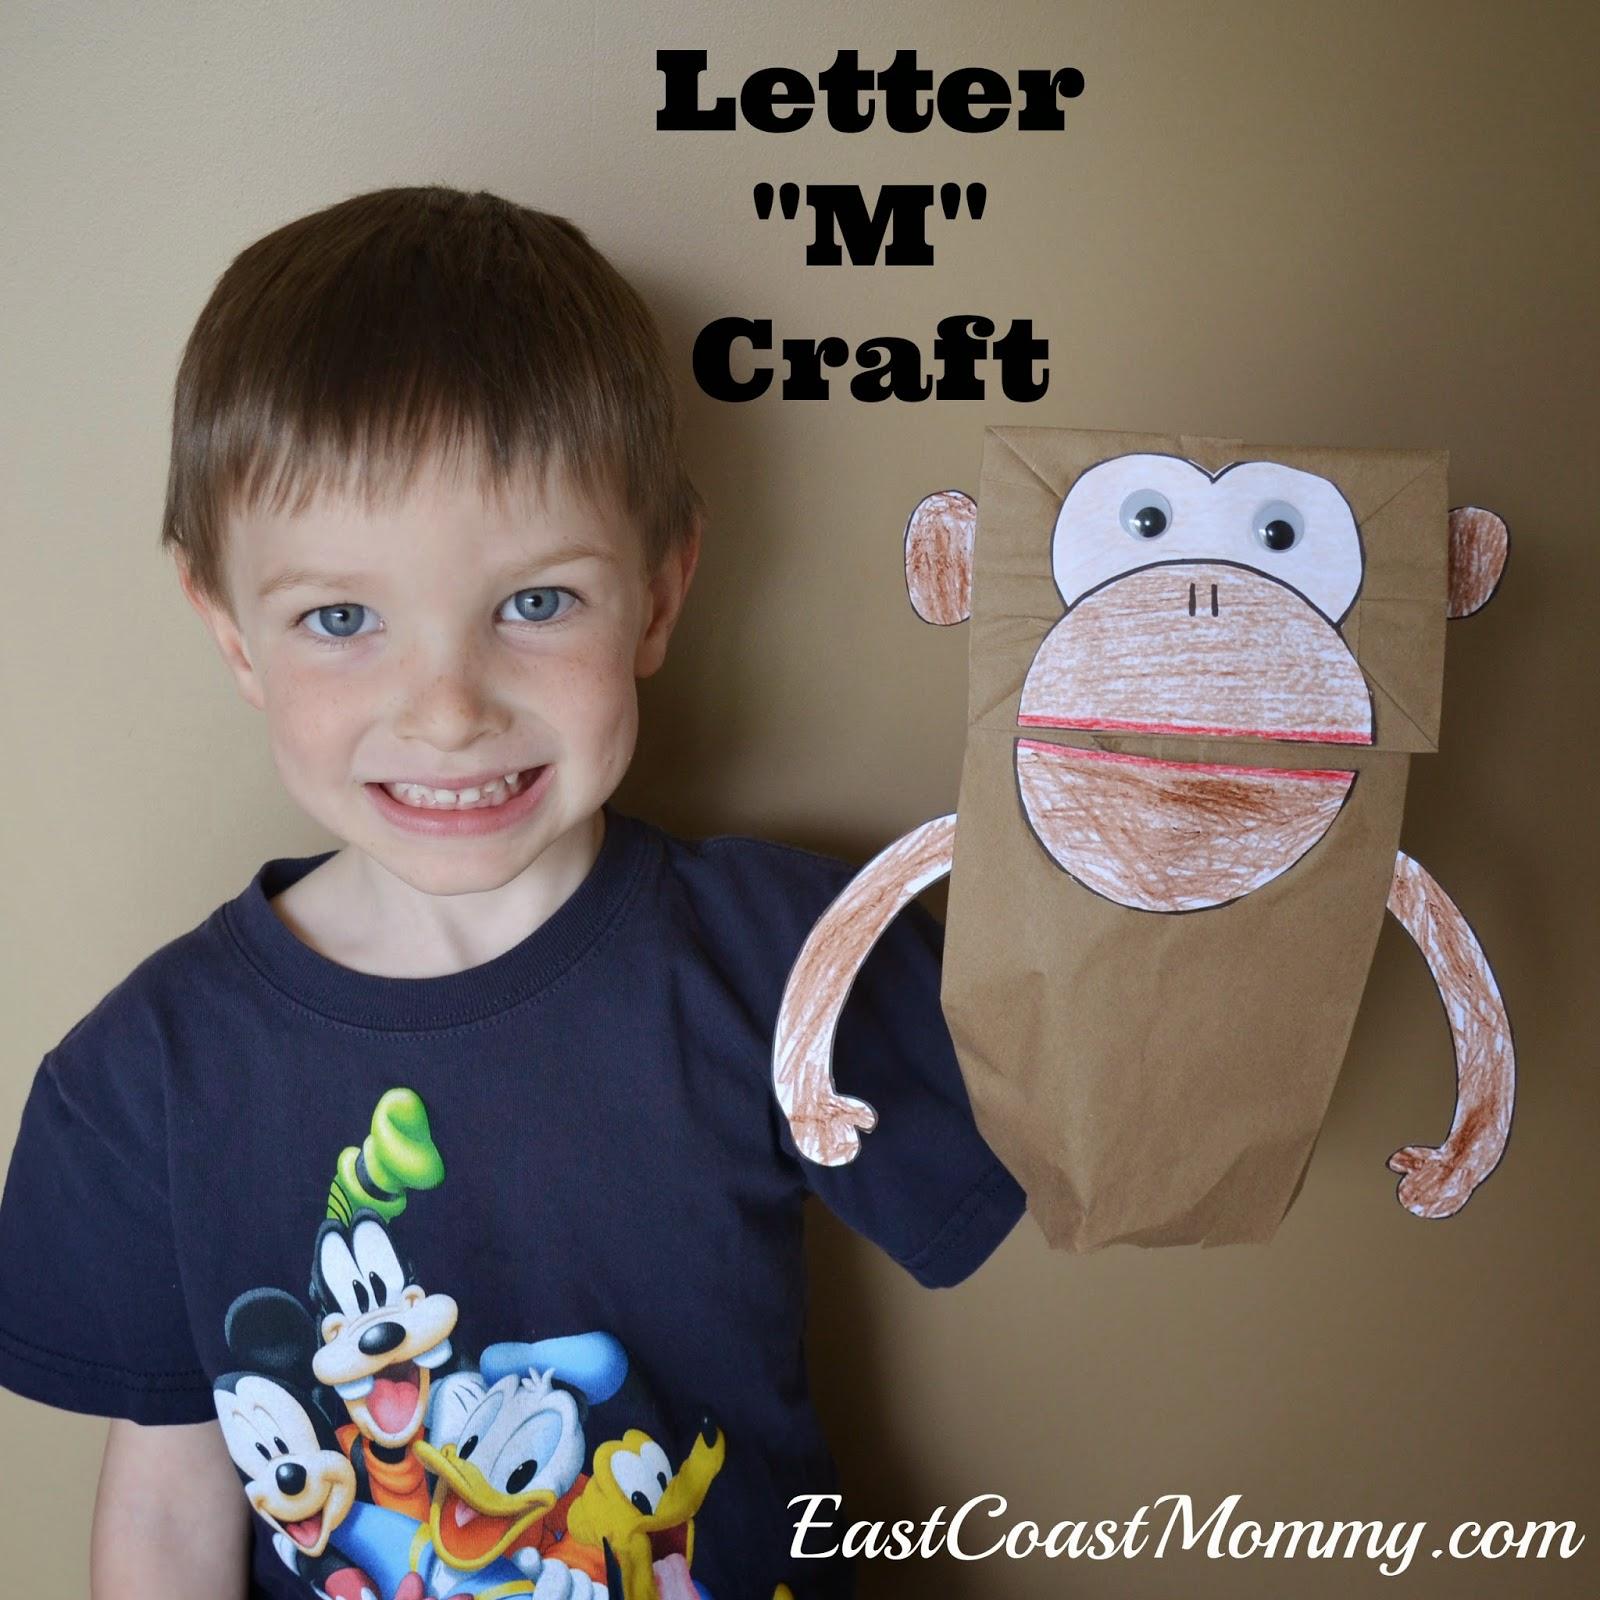 East Coast Mommy: Alphabet Craft - Letter M